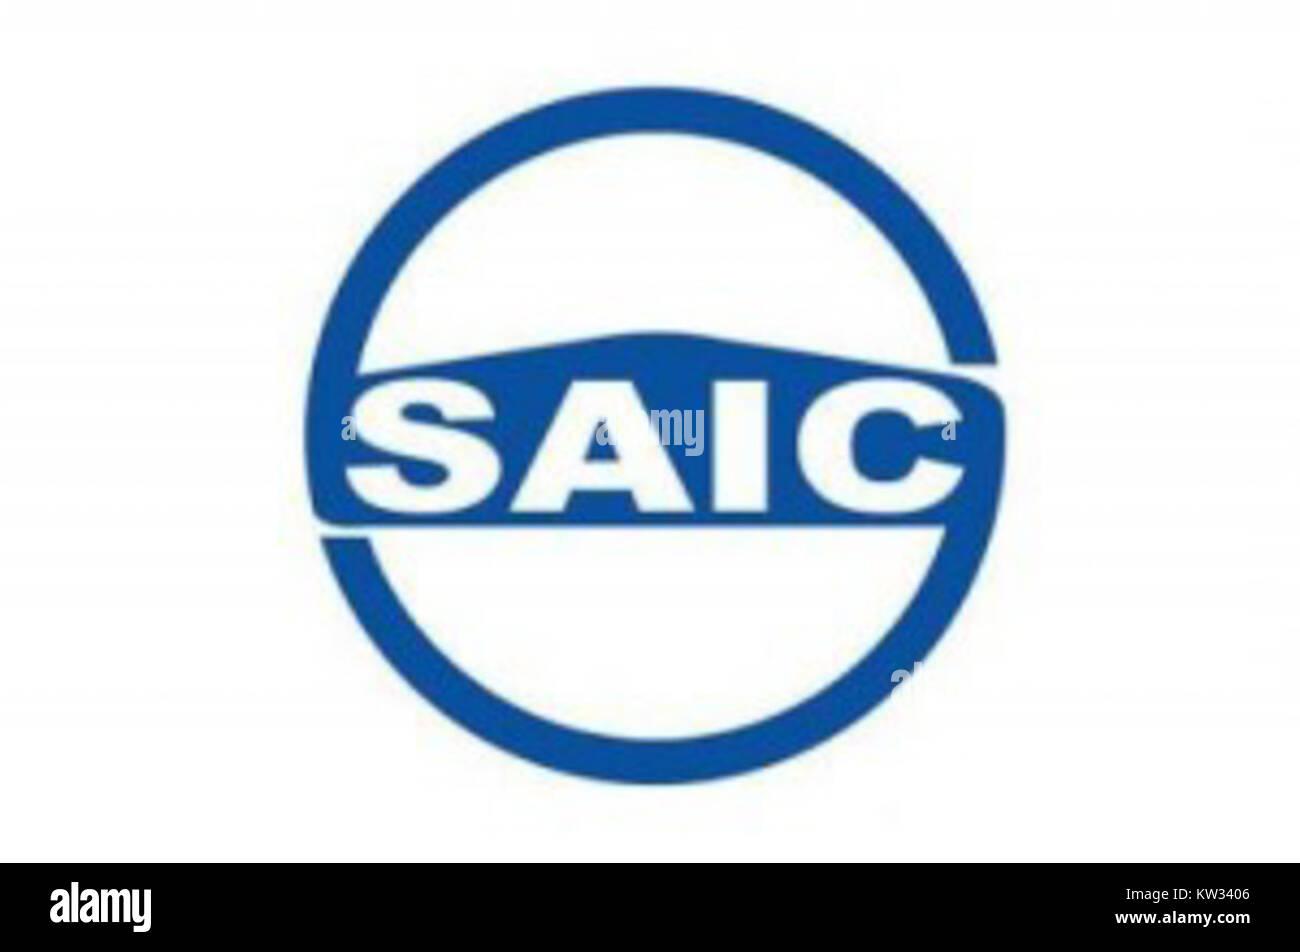 Saic Motor Corporation Stock Photo 170328710 Alamy